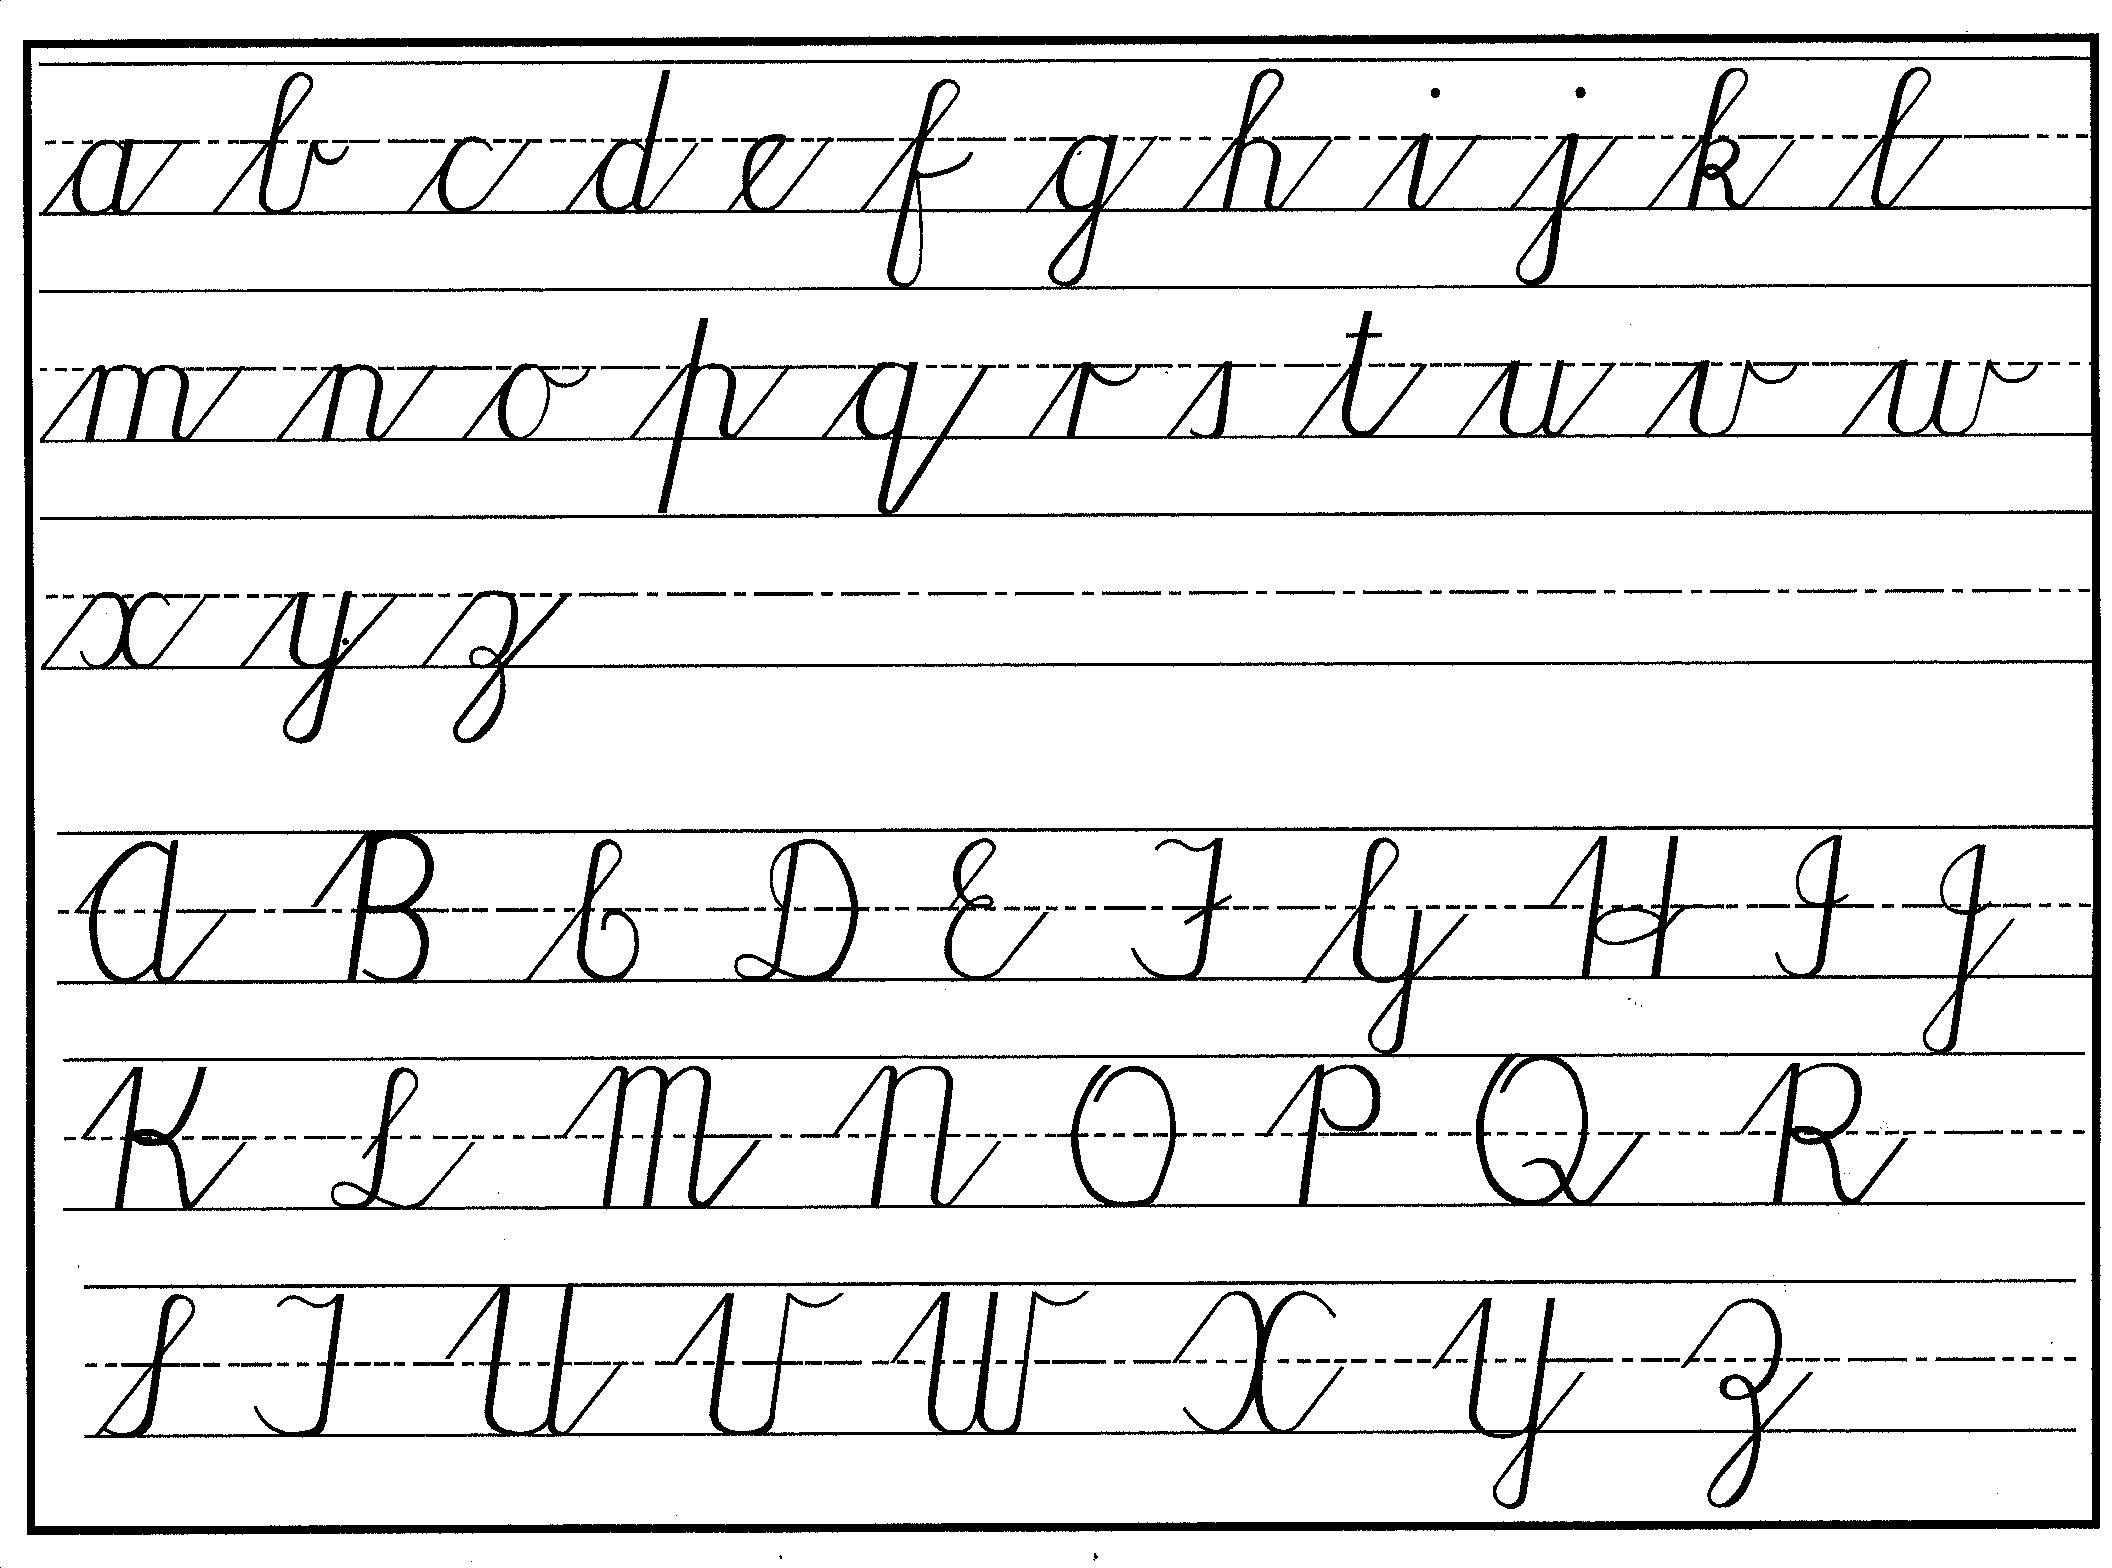 Preschool Writing Worksheets A-z For Beginners 1